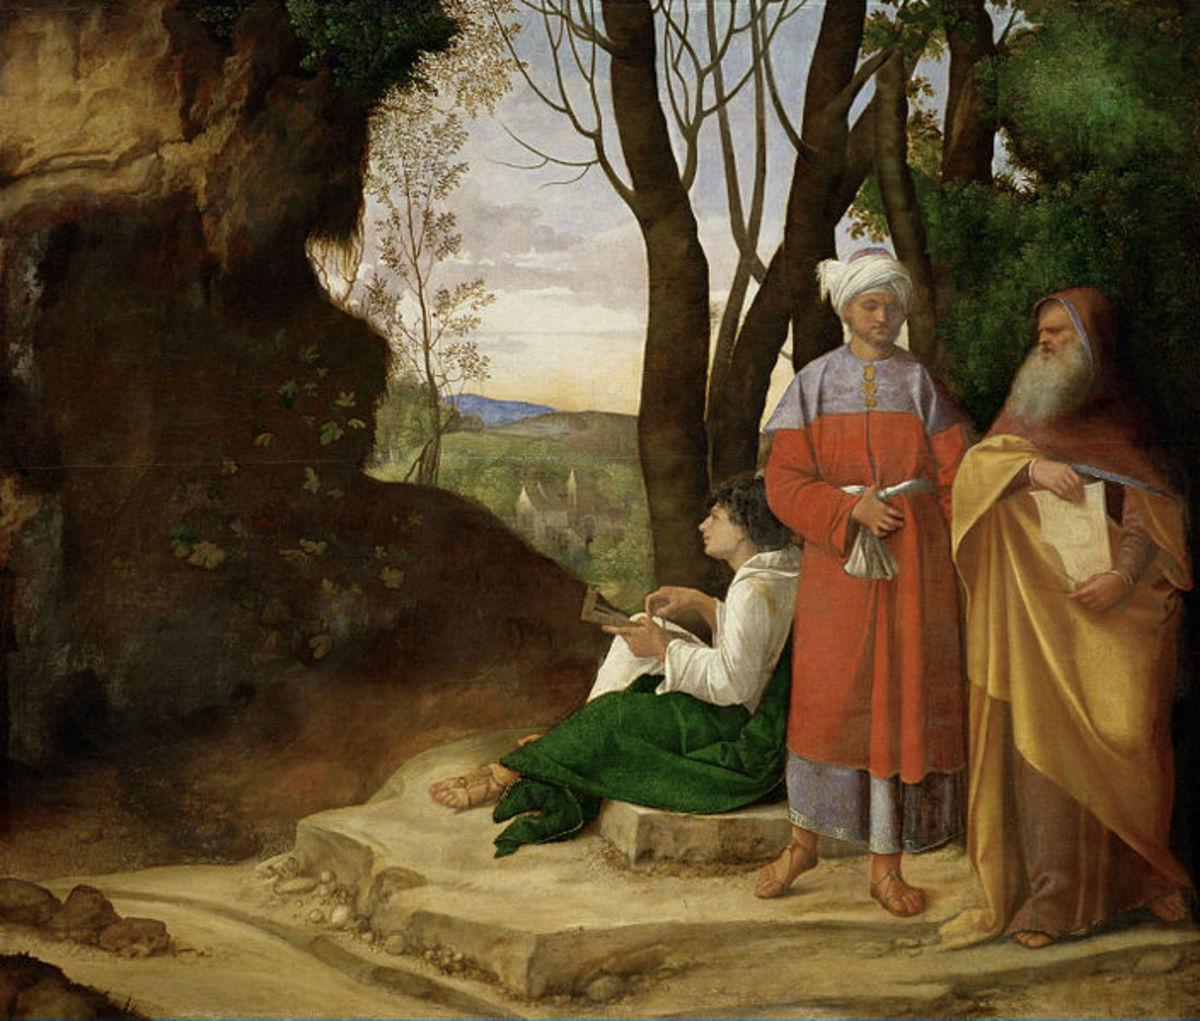 Giorgione, Three Philosophers (1506-1508), Wien Kunsthistorisches Museum